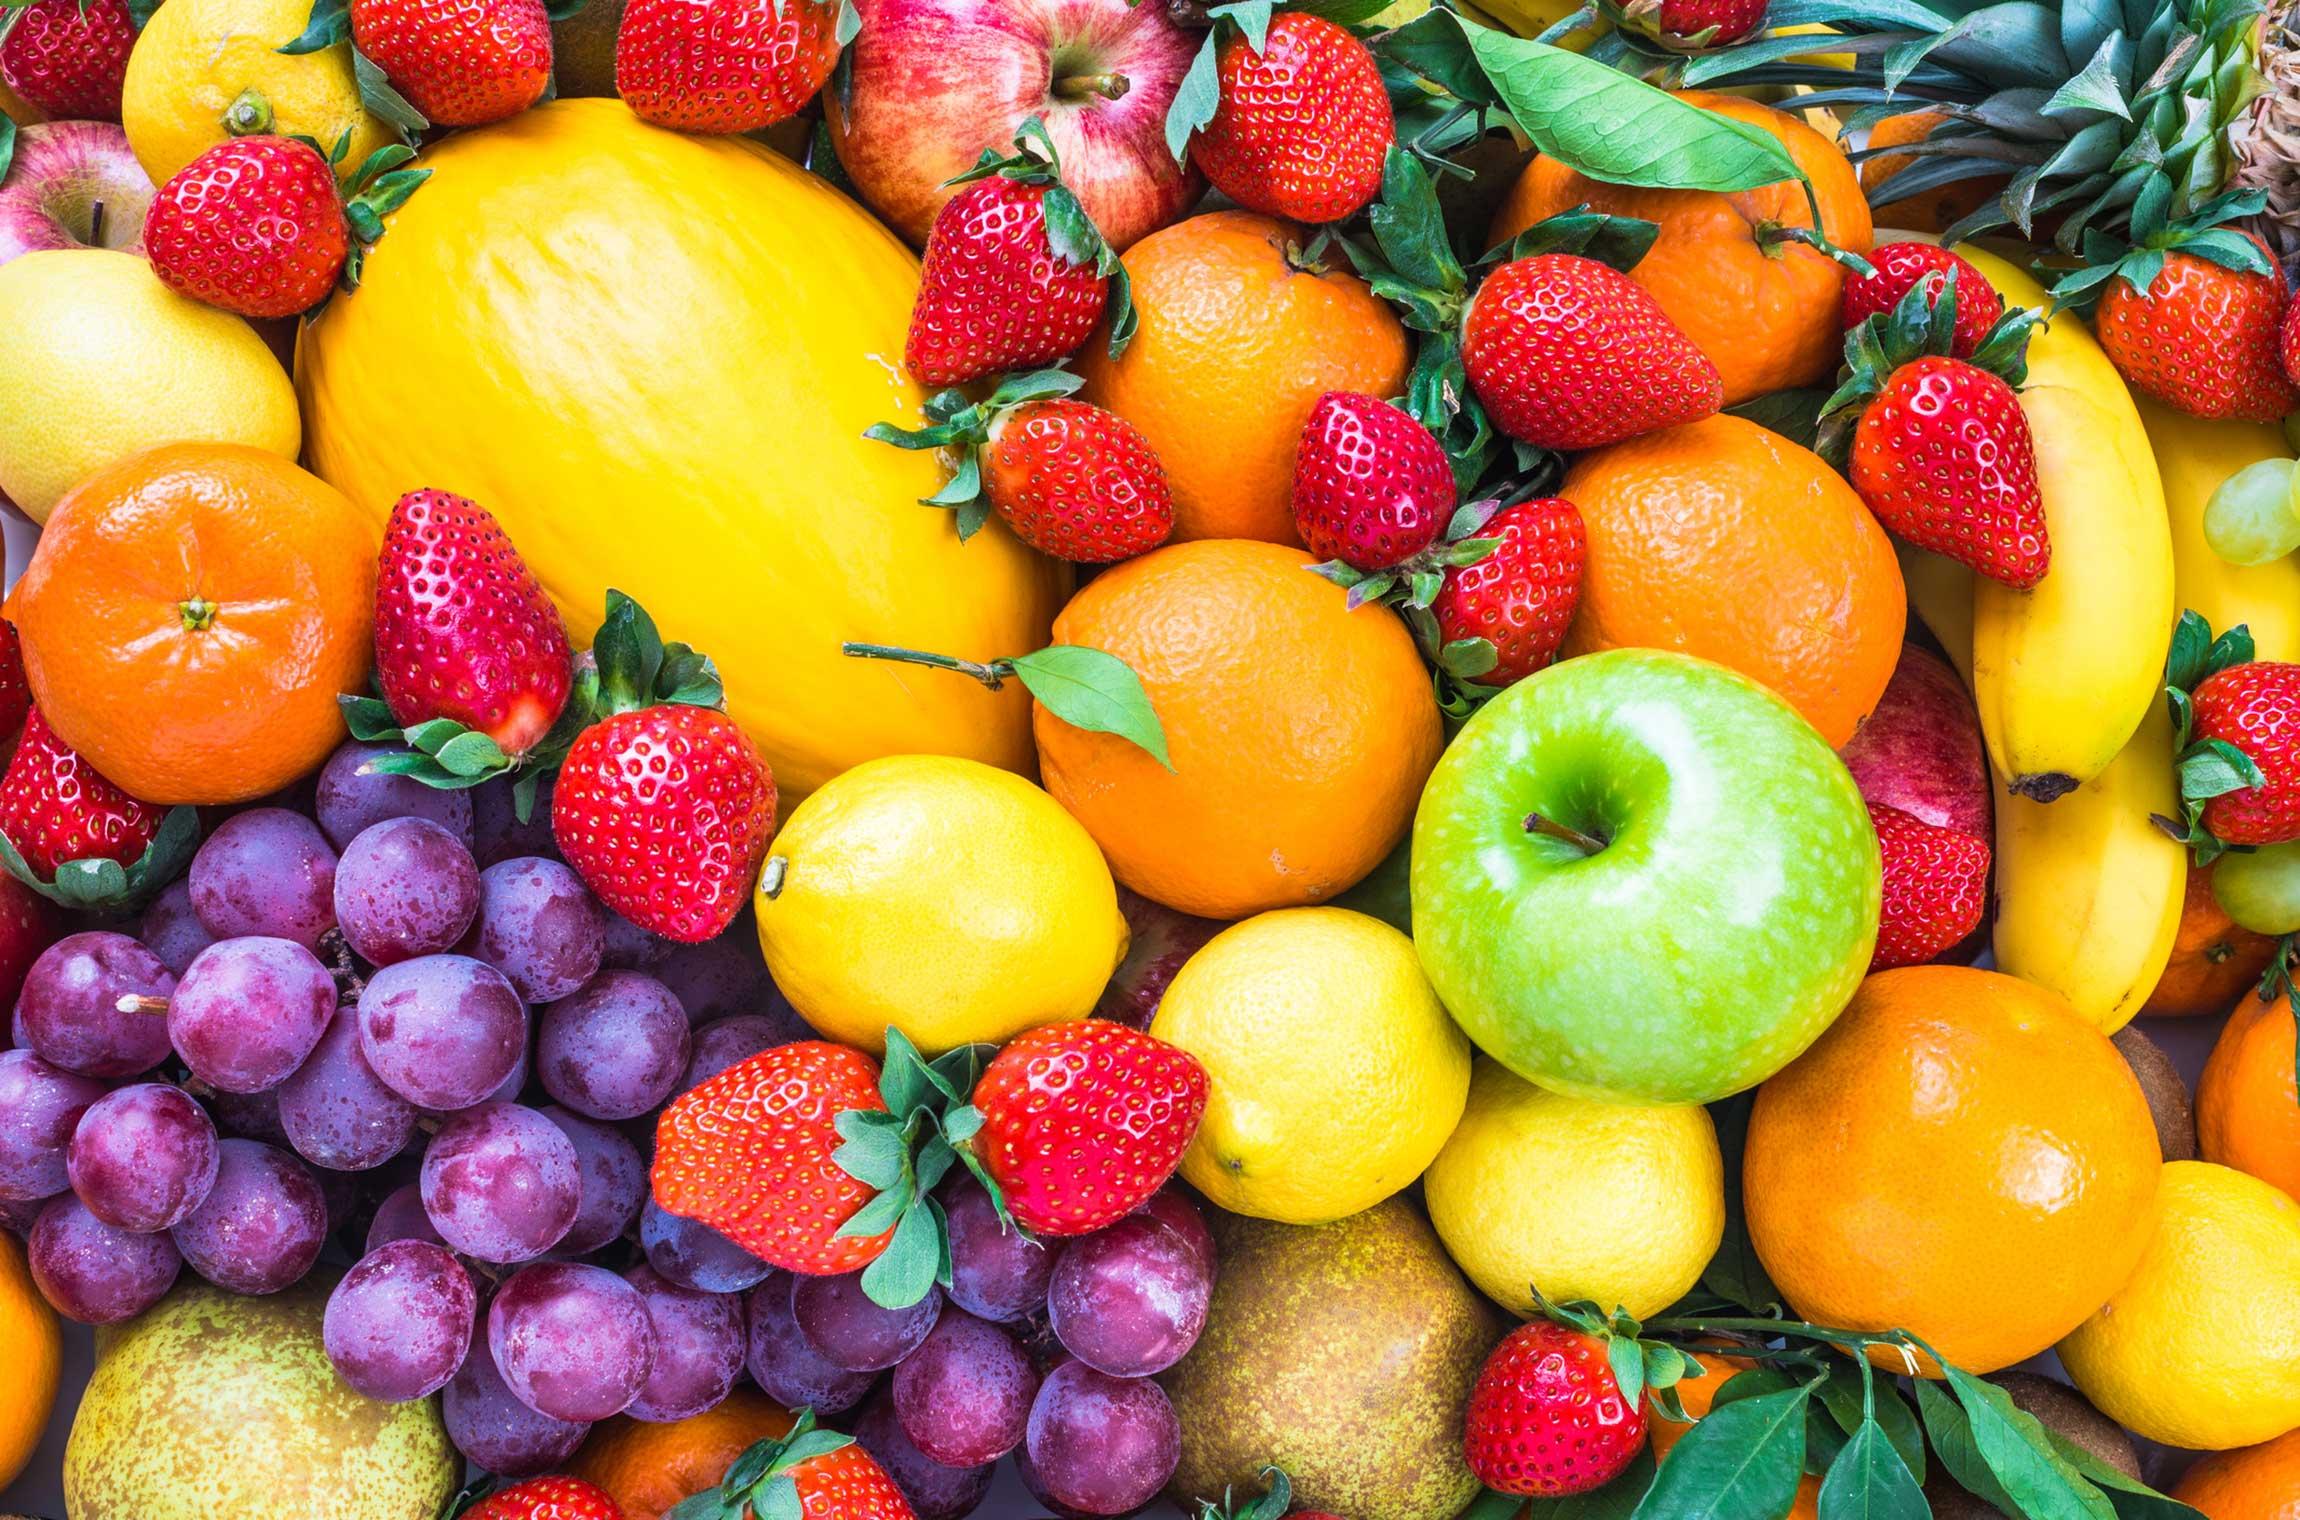 Healthy Snacks: Fruit